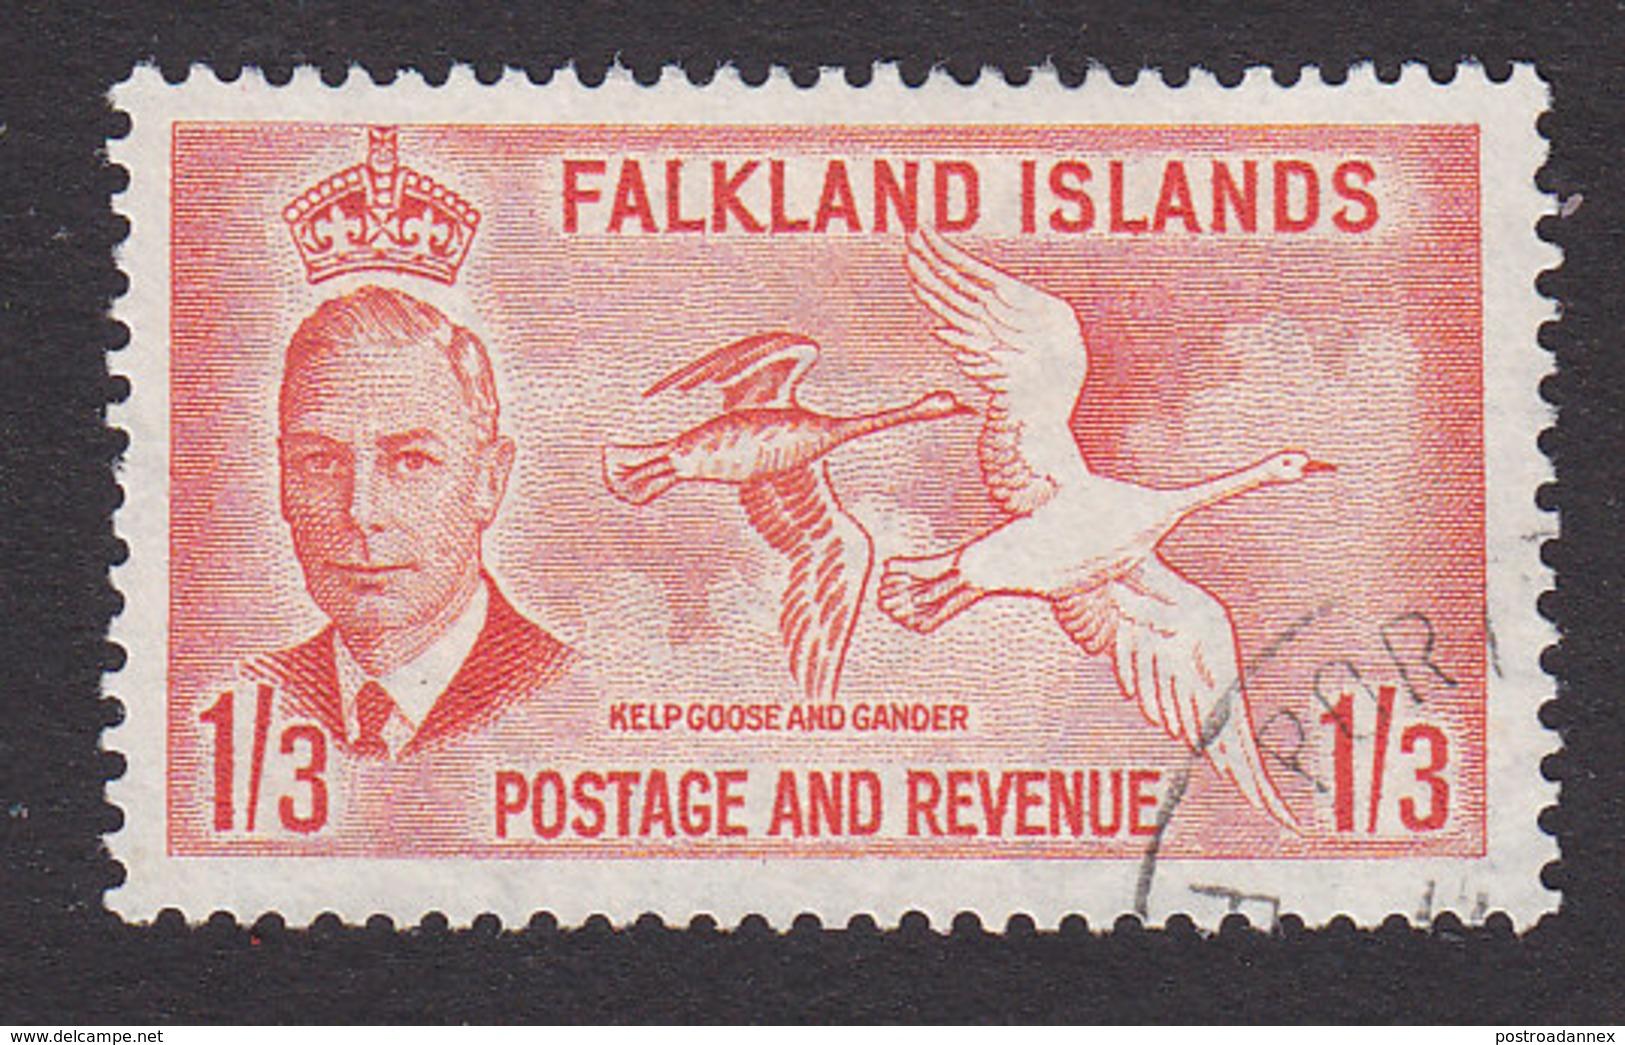 Falkland Islands, Scott #116, Used, George V And Scenes And Industry Of Falkland Islands, Issued 1952 - Falkland Islands